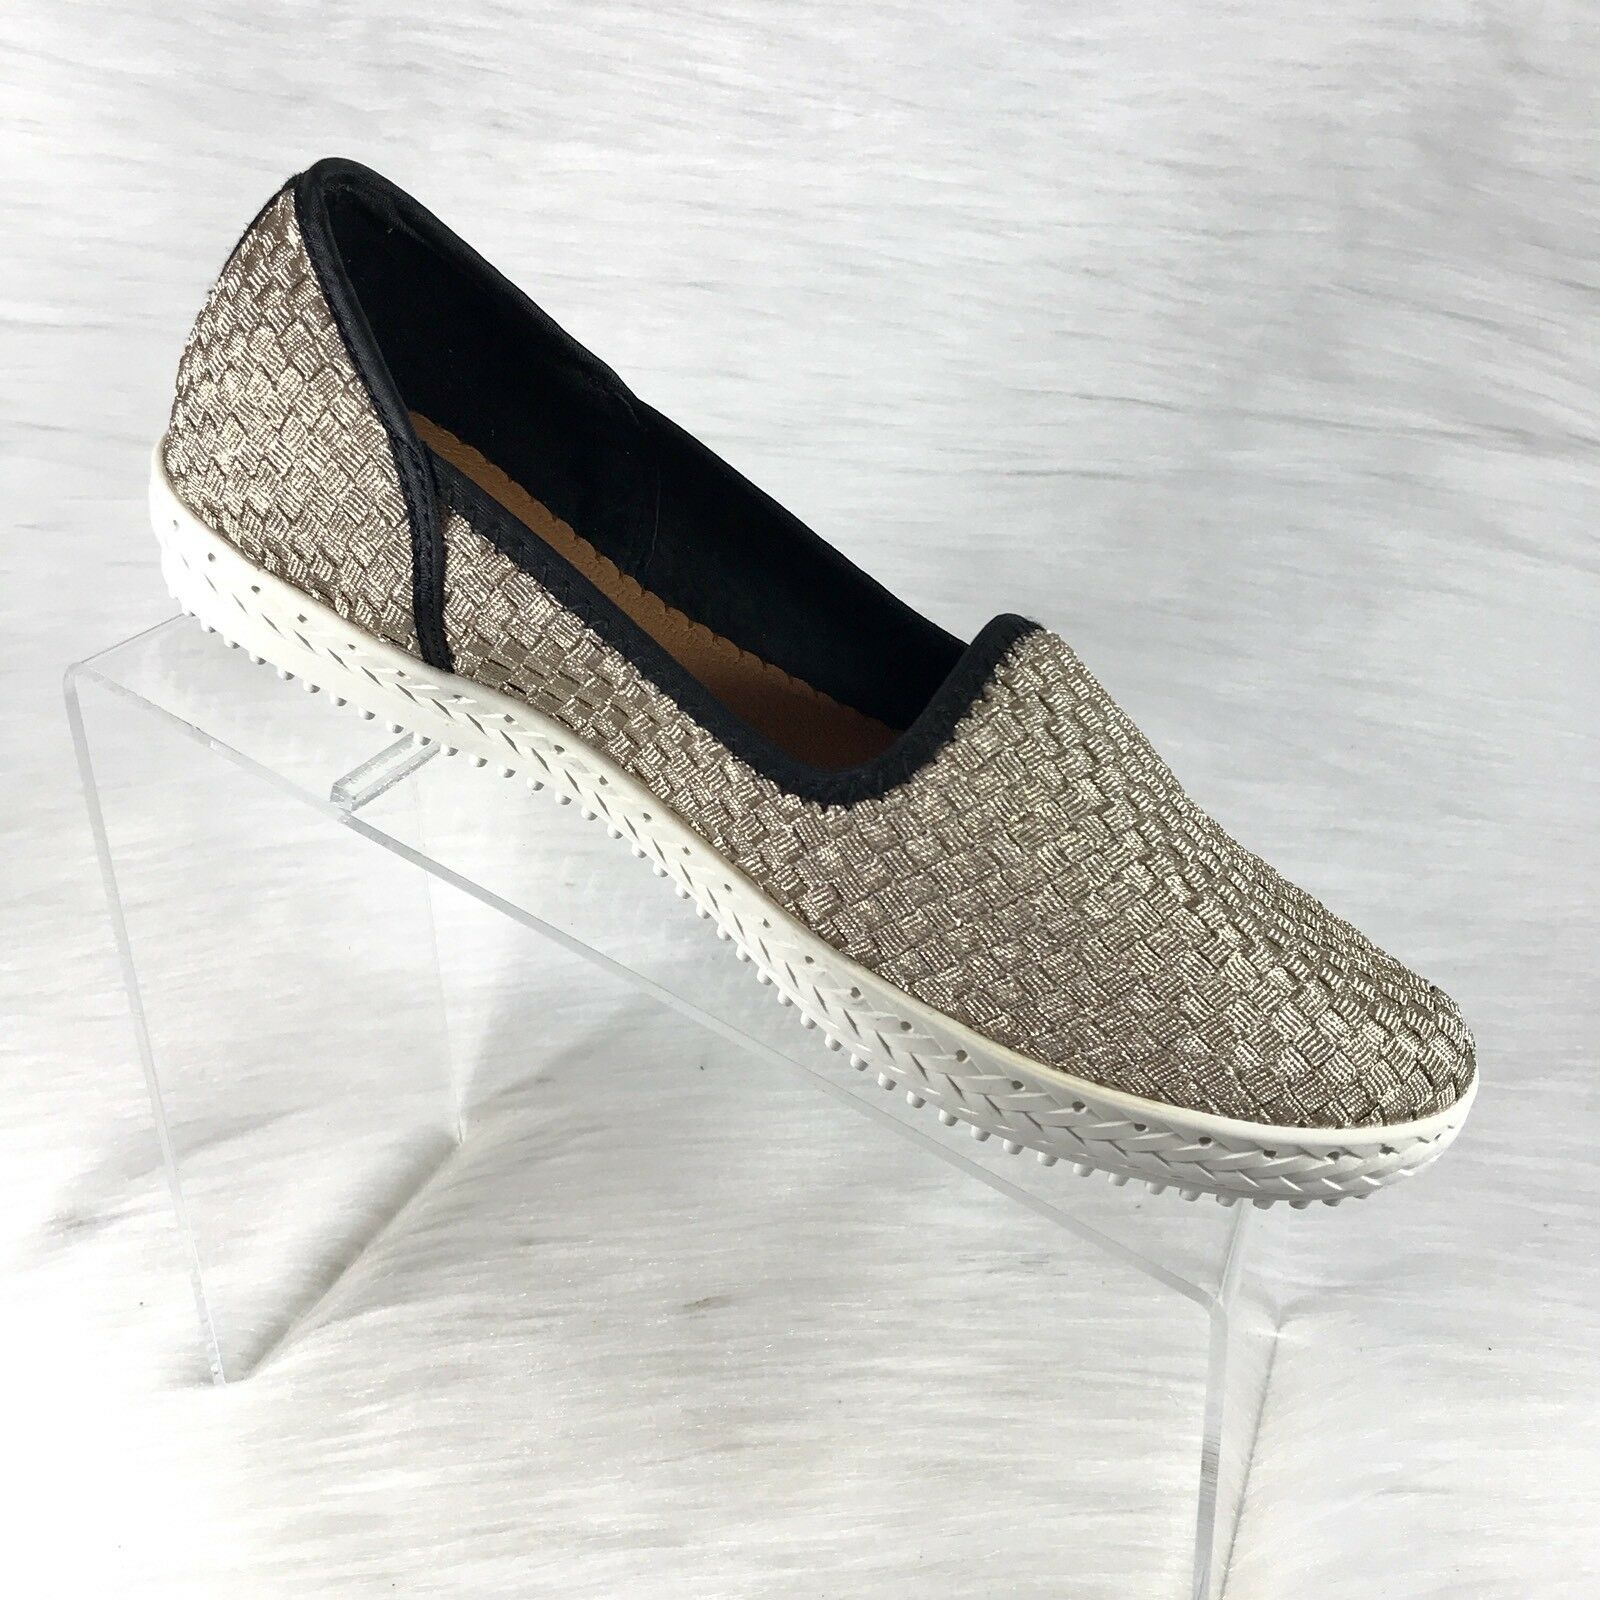 New Bernie Mev Women's Easy Ballet Flats Light gold Woven Size 41 US 10.5